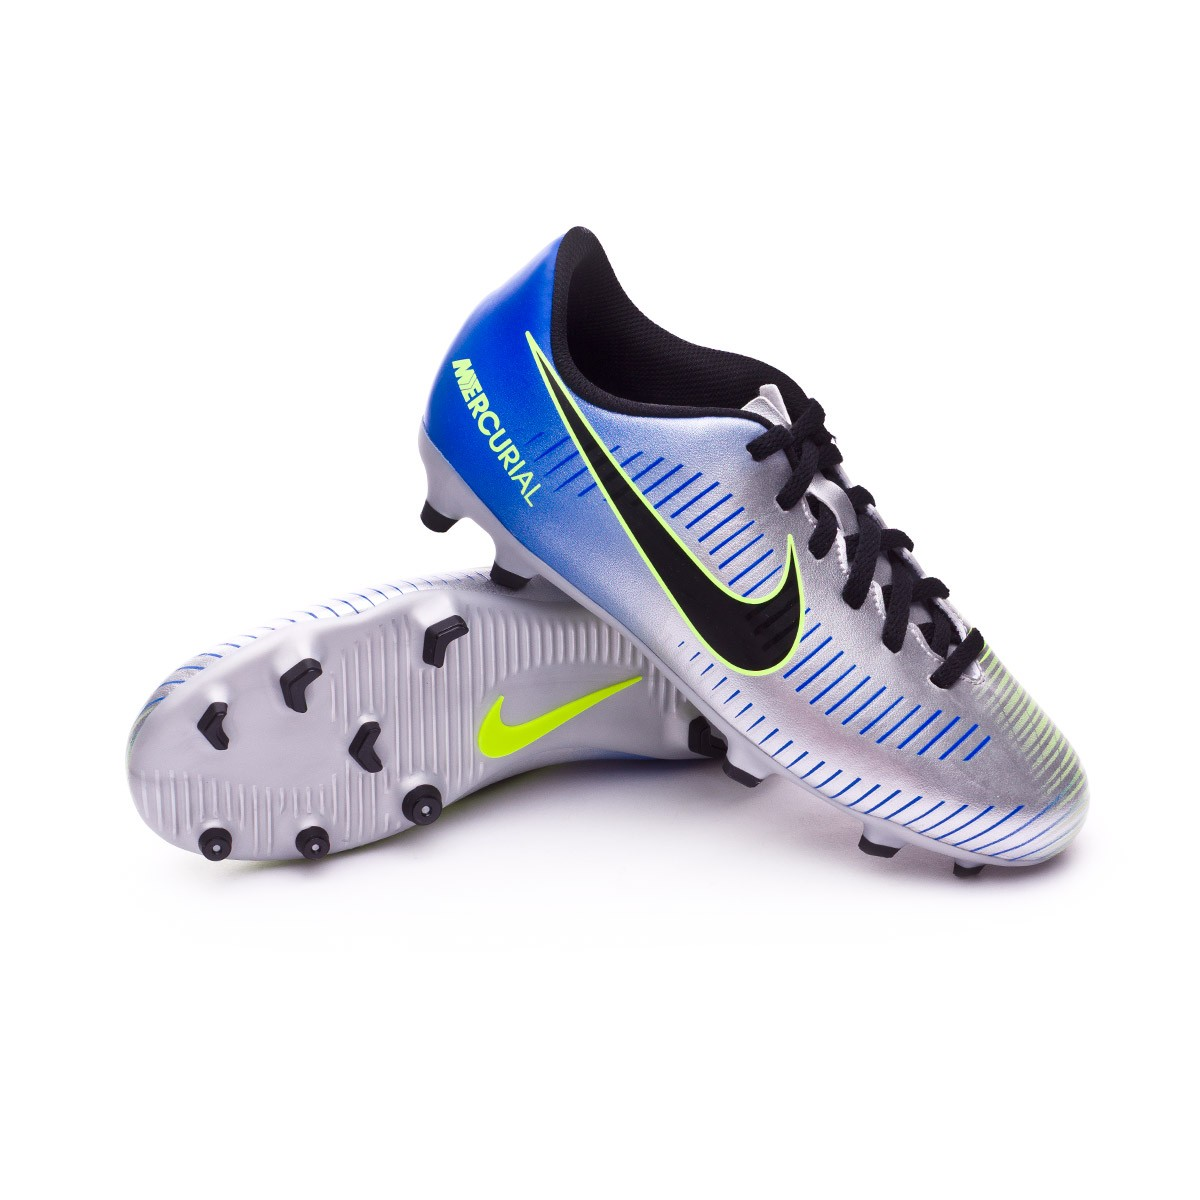 Bota de fútbol Nike Mercurial Vortex III FG Neymar Niño Racer  blue-Black-Chrome-Volt - Leaked soccer 8f2f2141e98ad